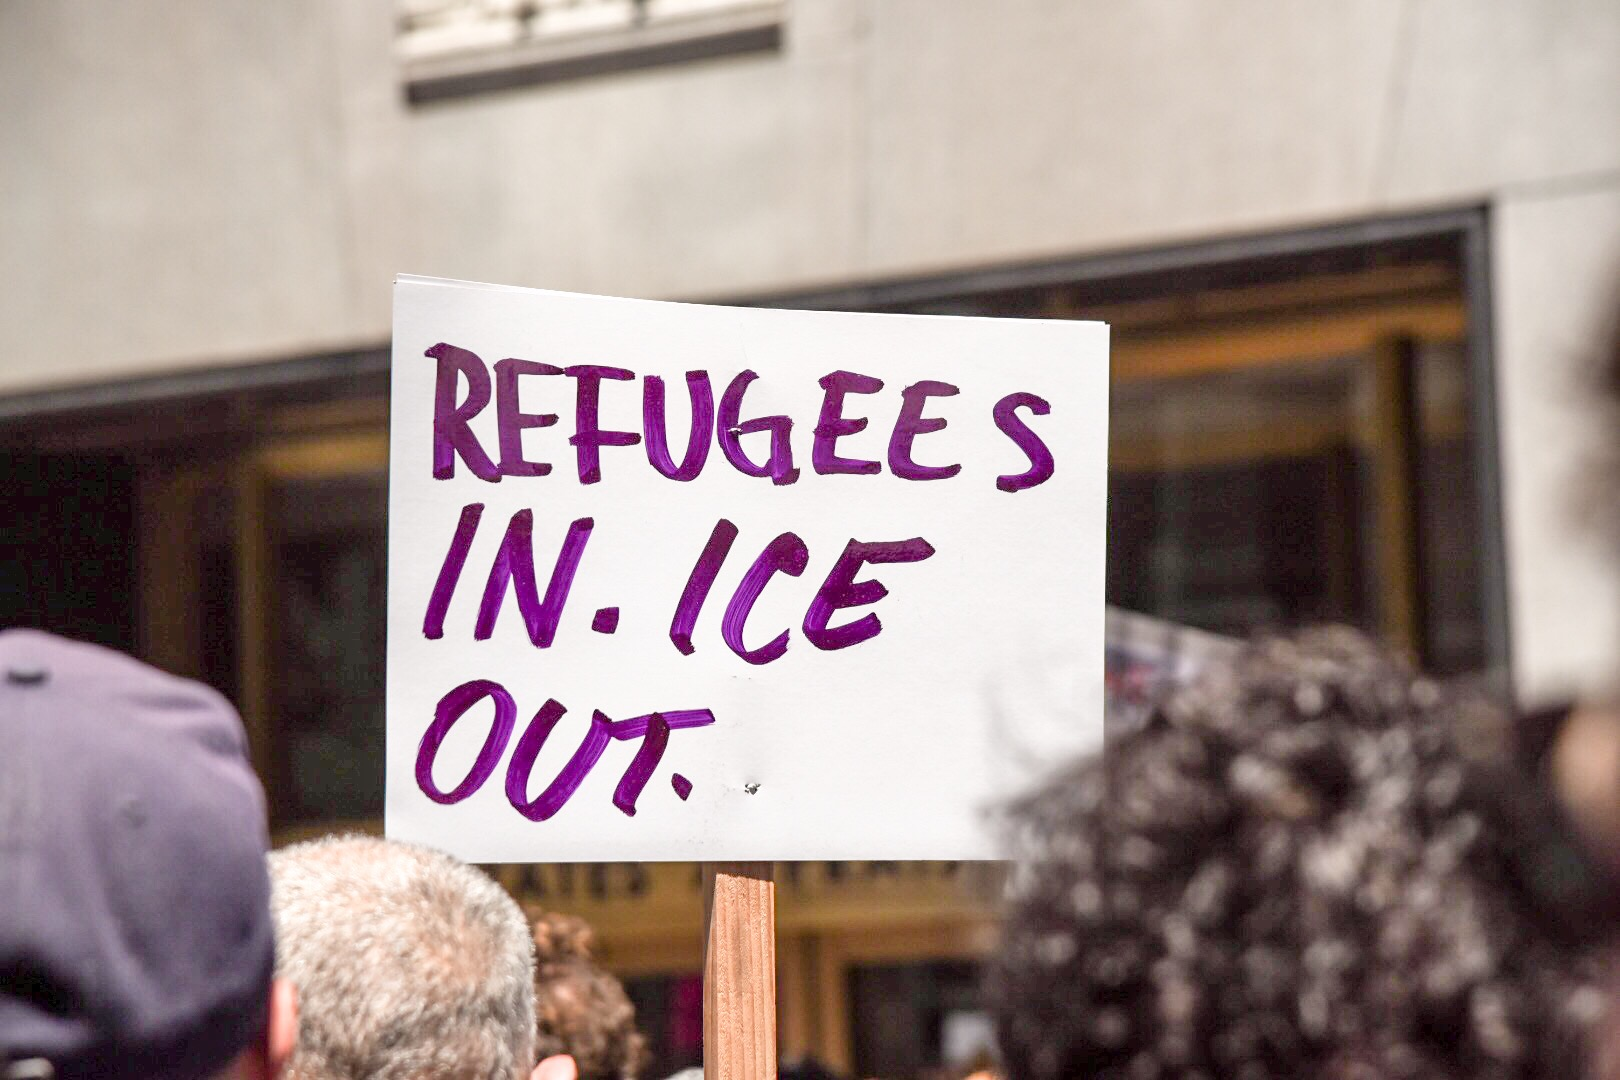 Ice protest 2018